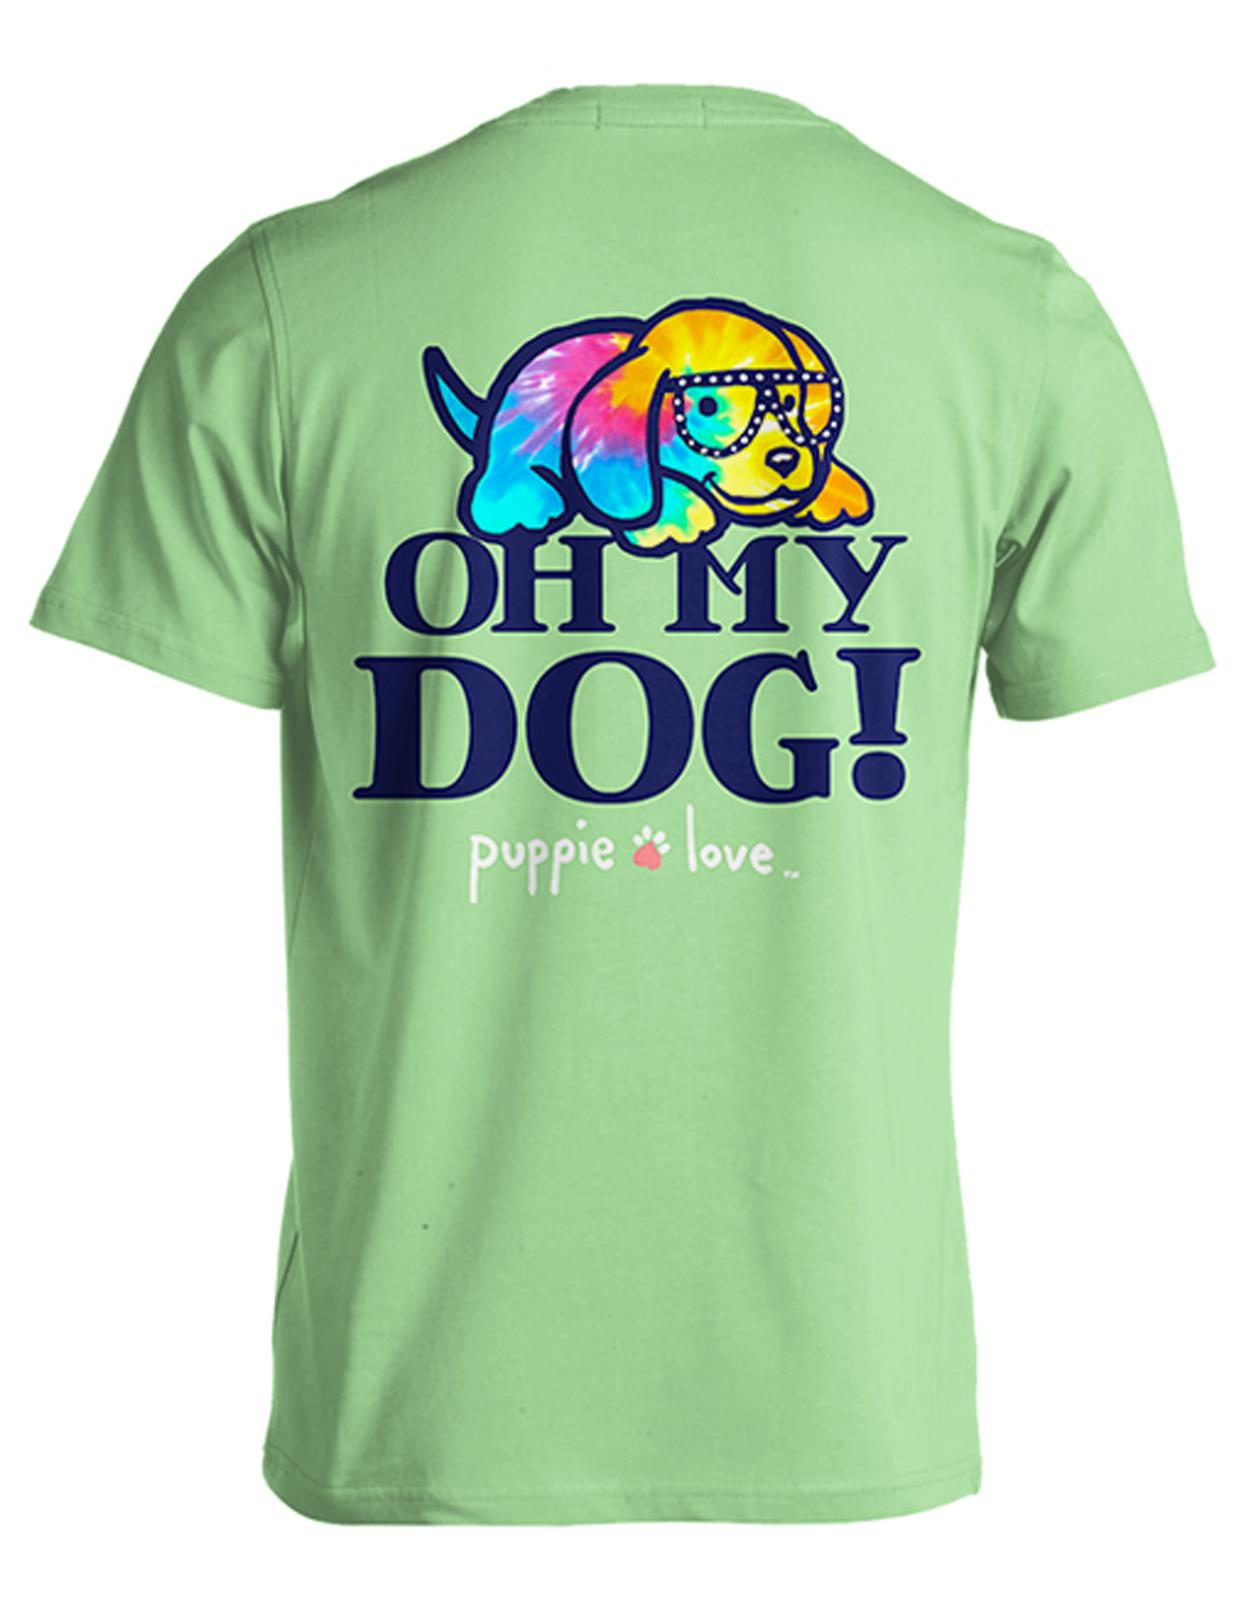 Oh my dog pup 196 min ss 1